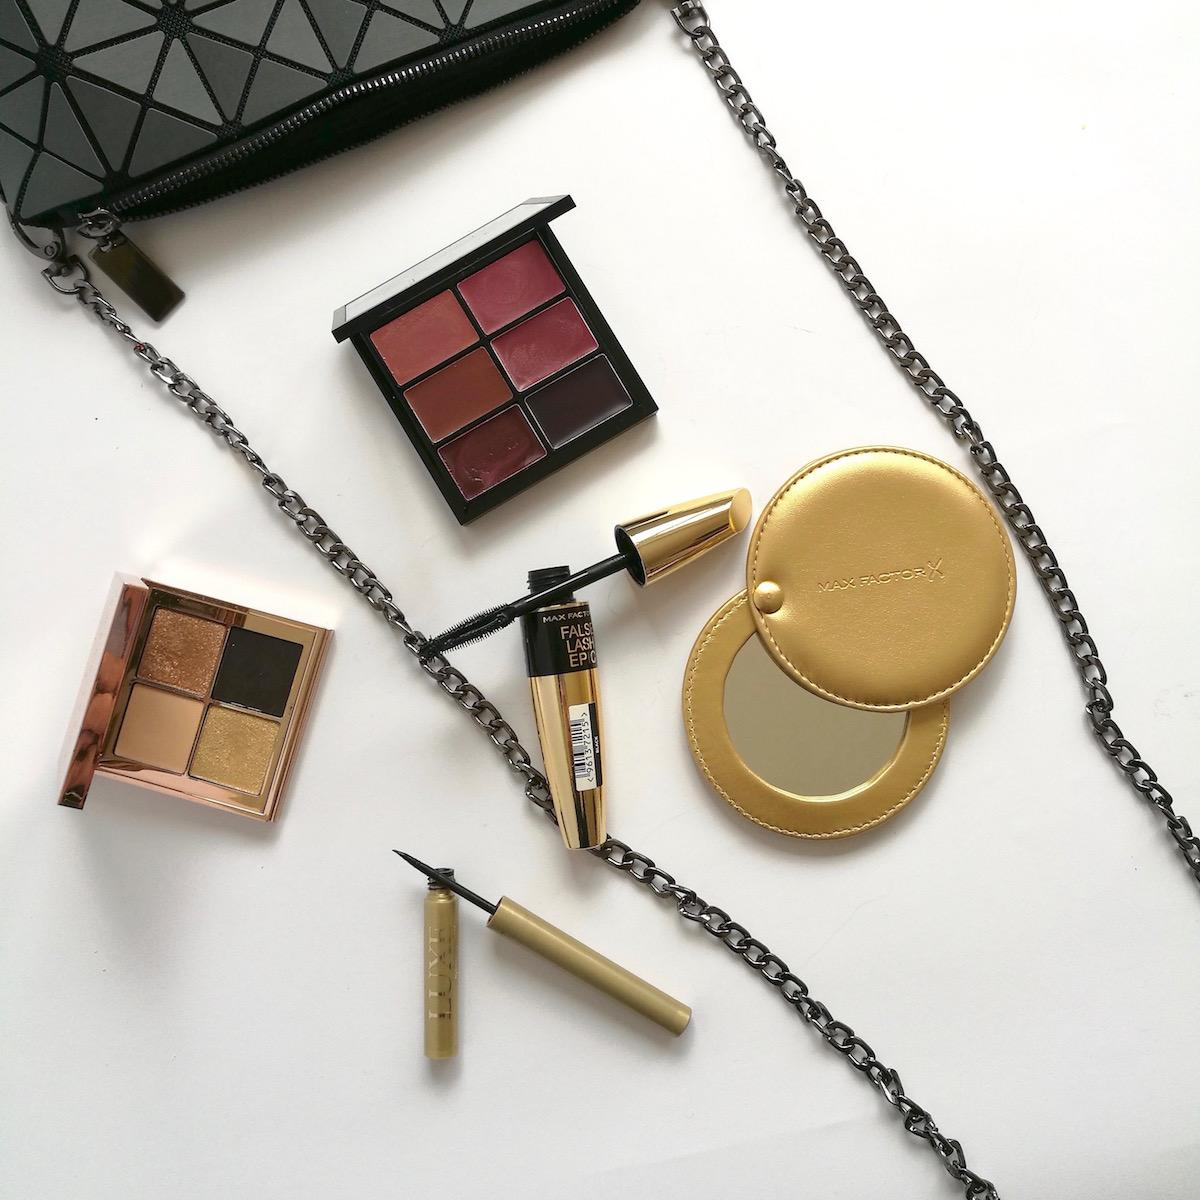 Nika Veger licenje makeup Bobbi Brown max factor maskara